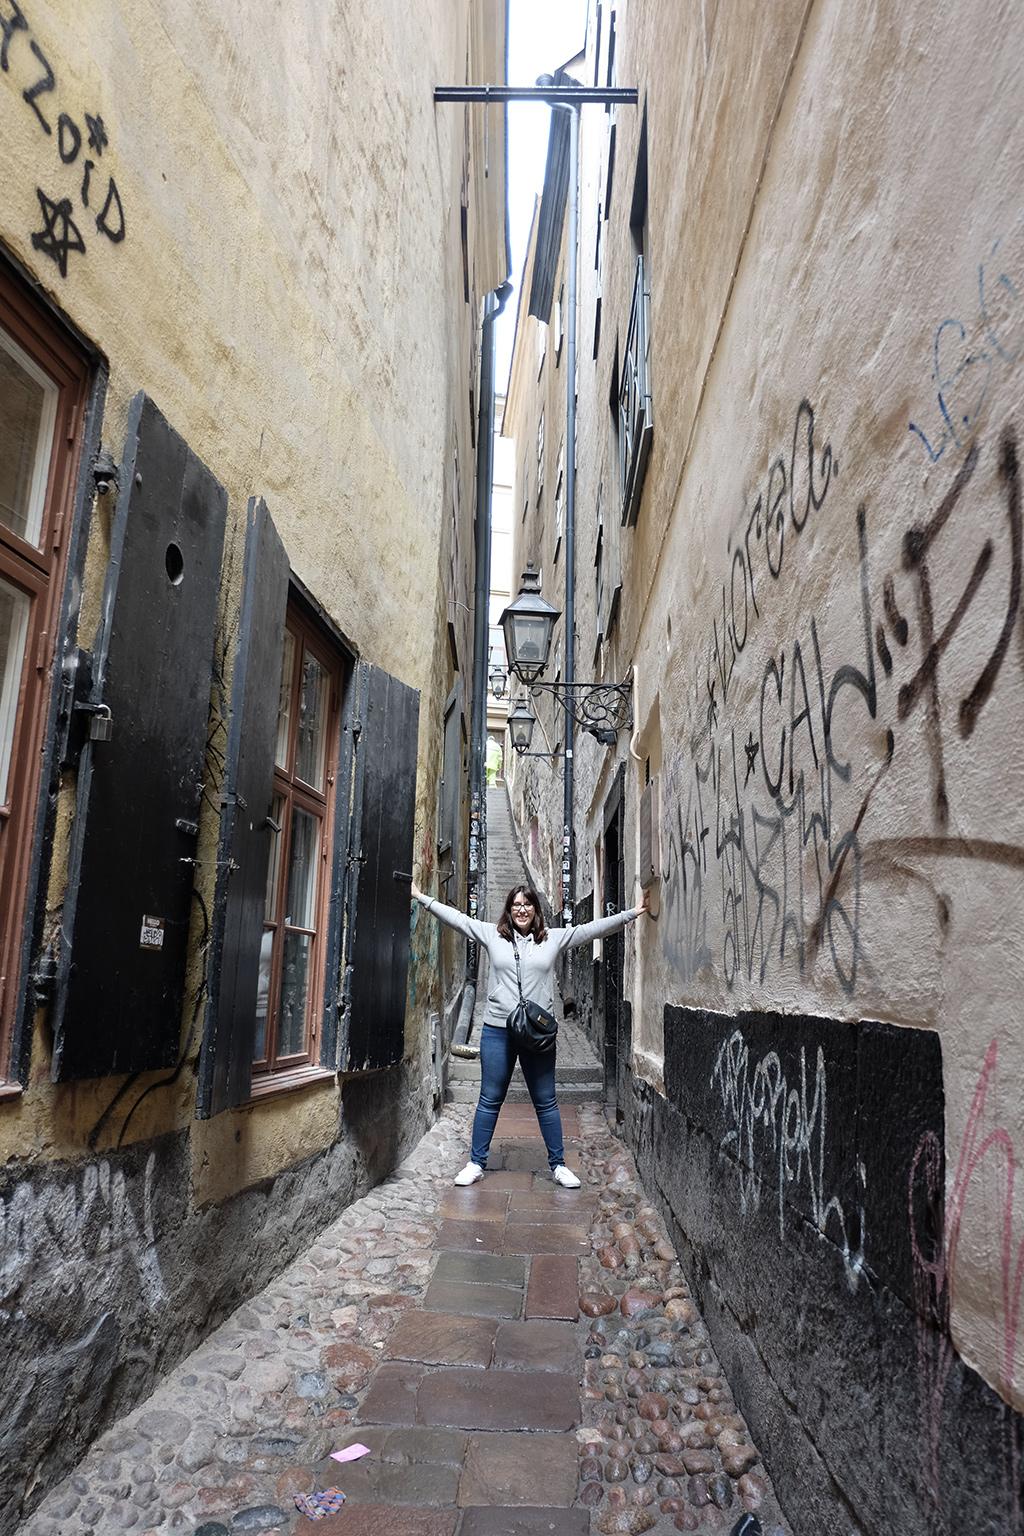 Mårten Trotzigs gränd - Stockholm's narrowest street